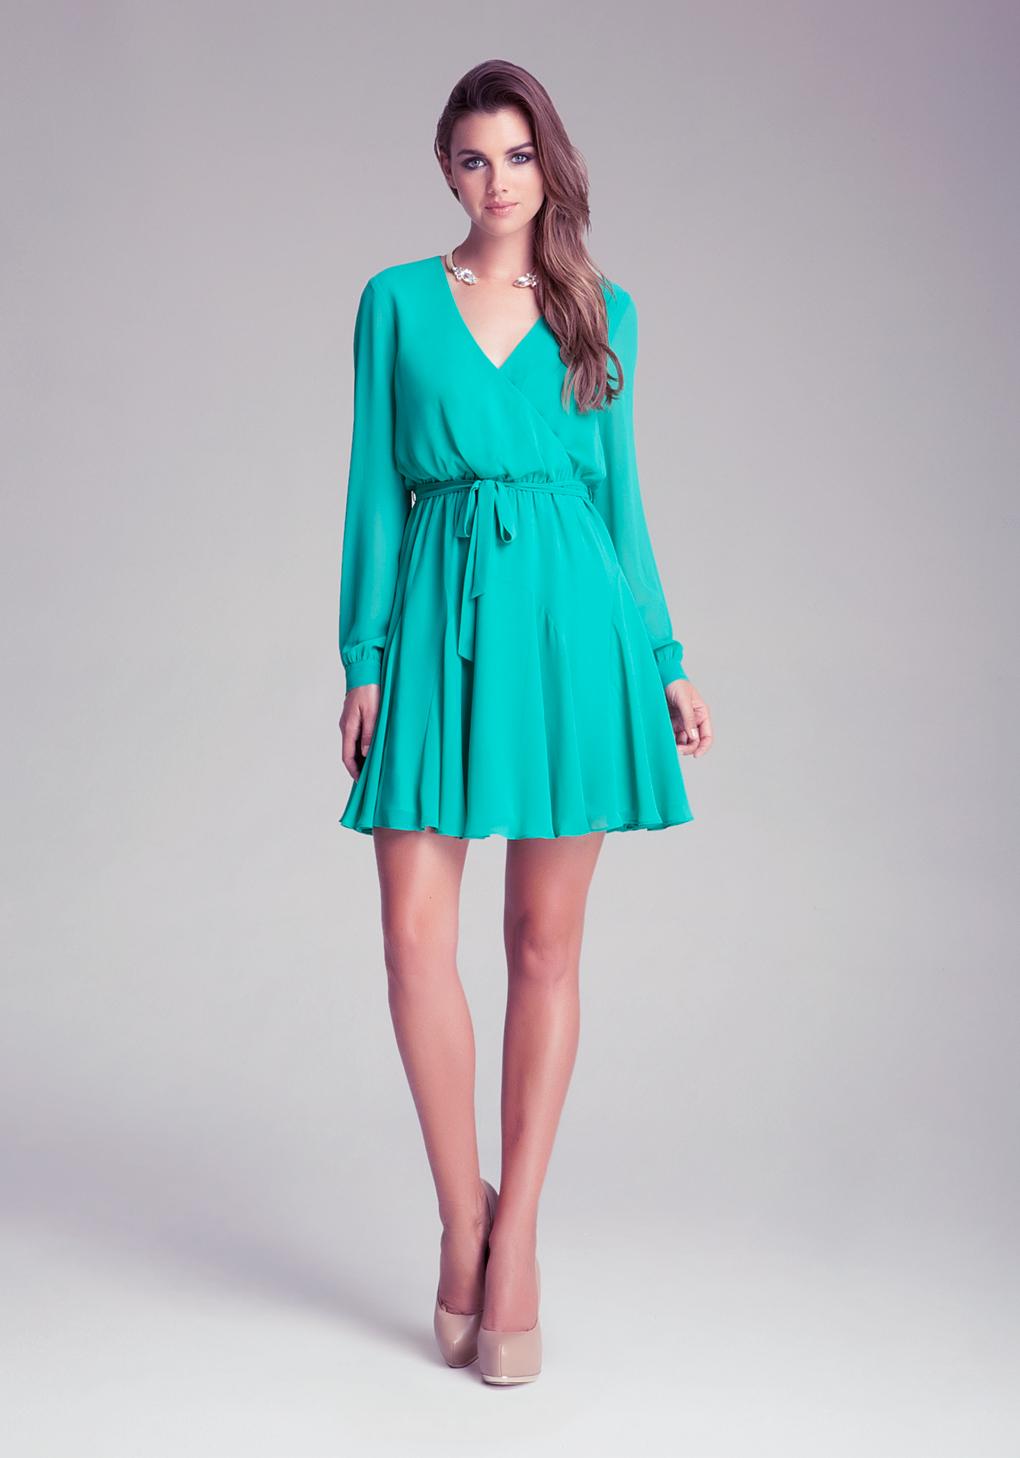 Long Bebe Dresses | Dress images